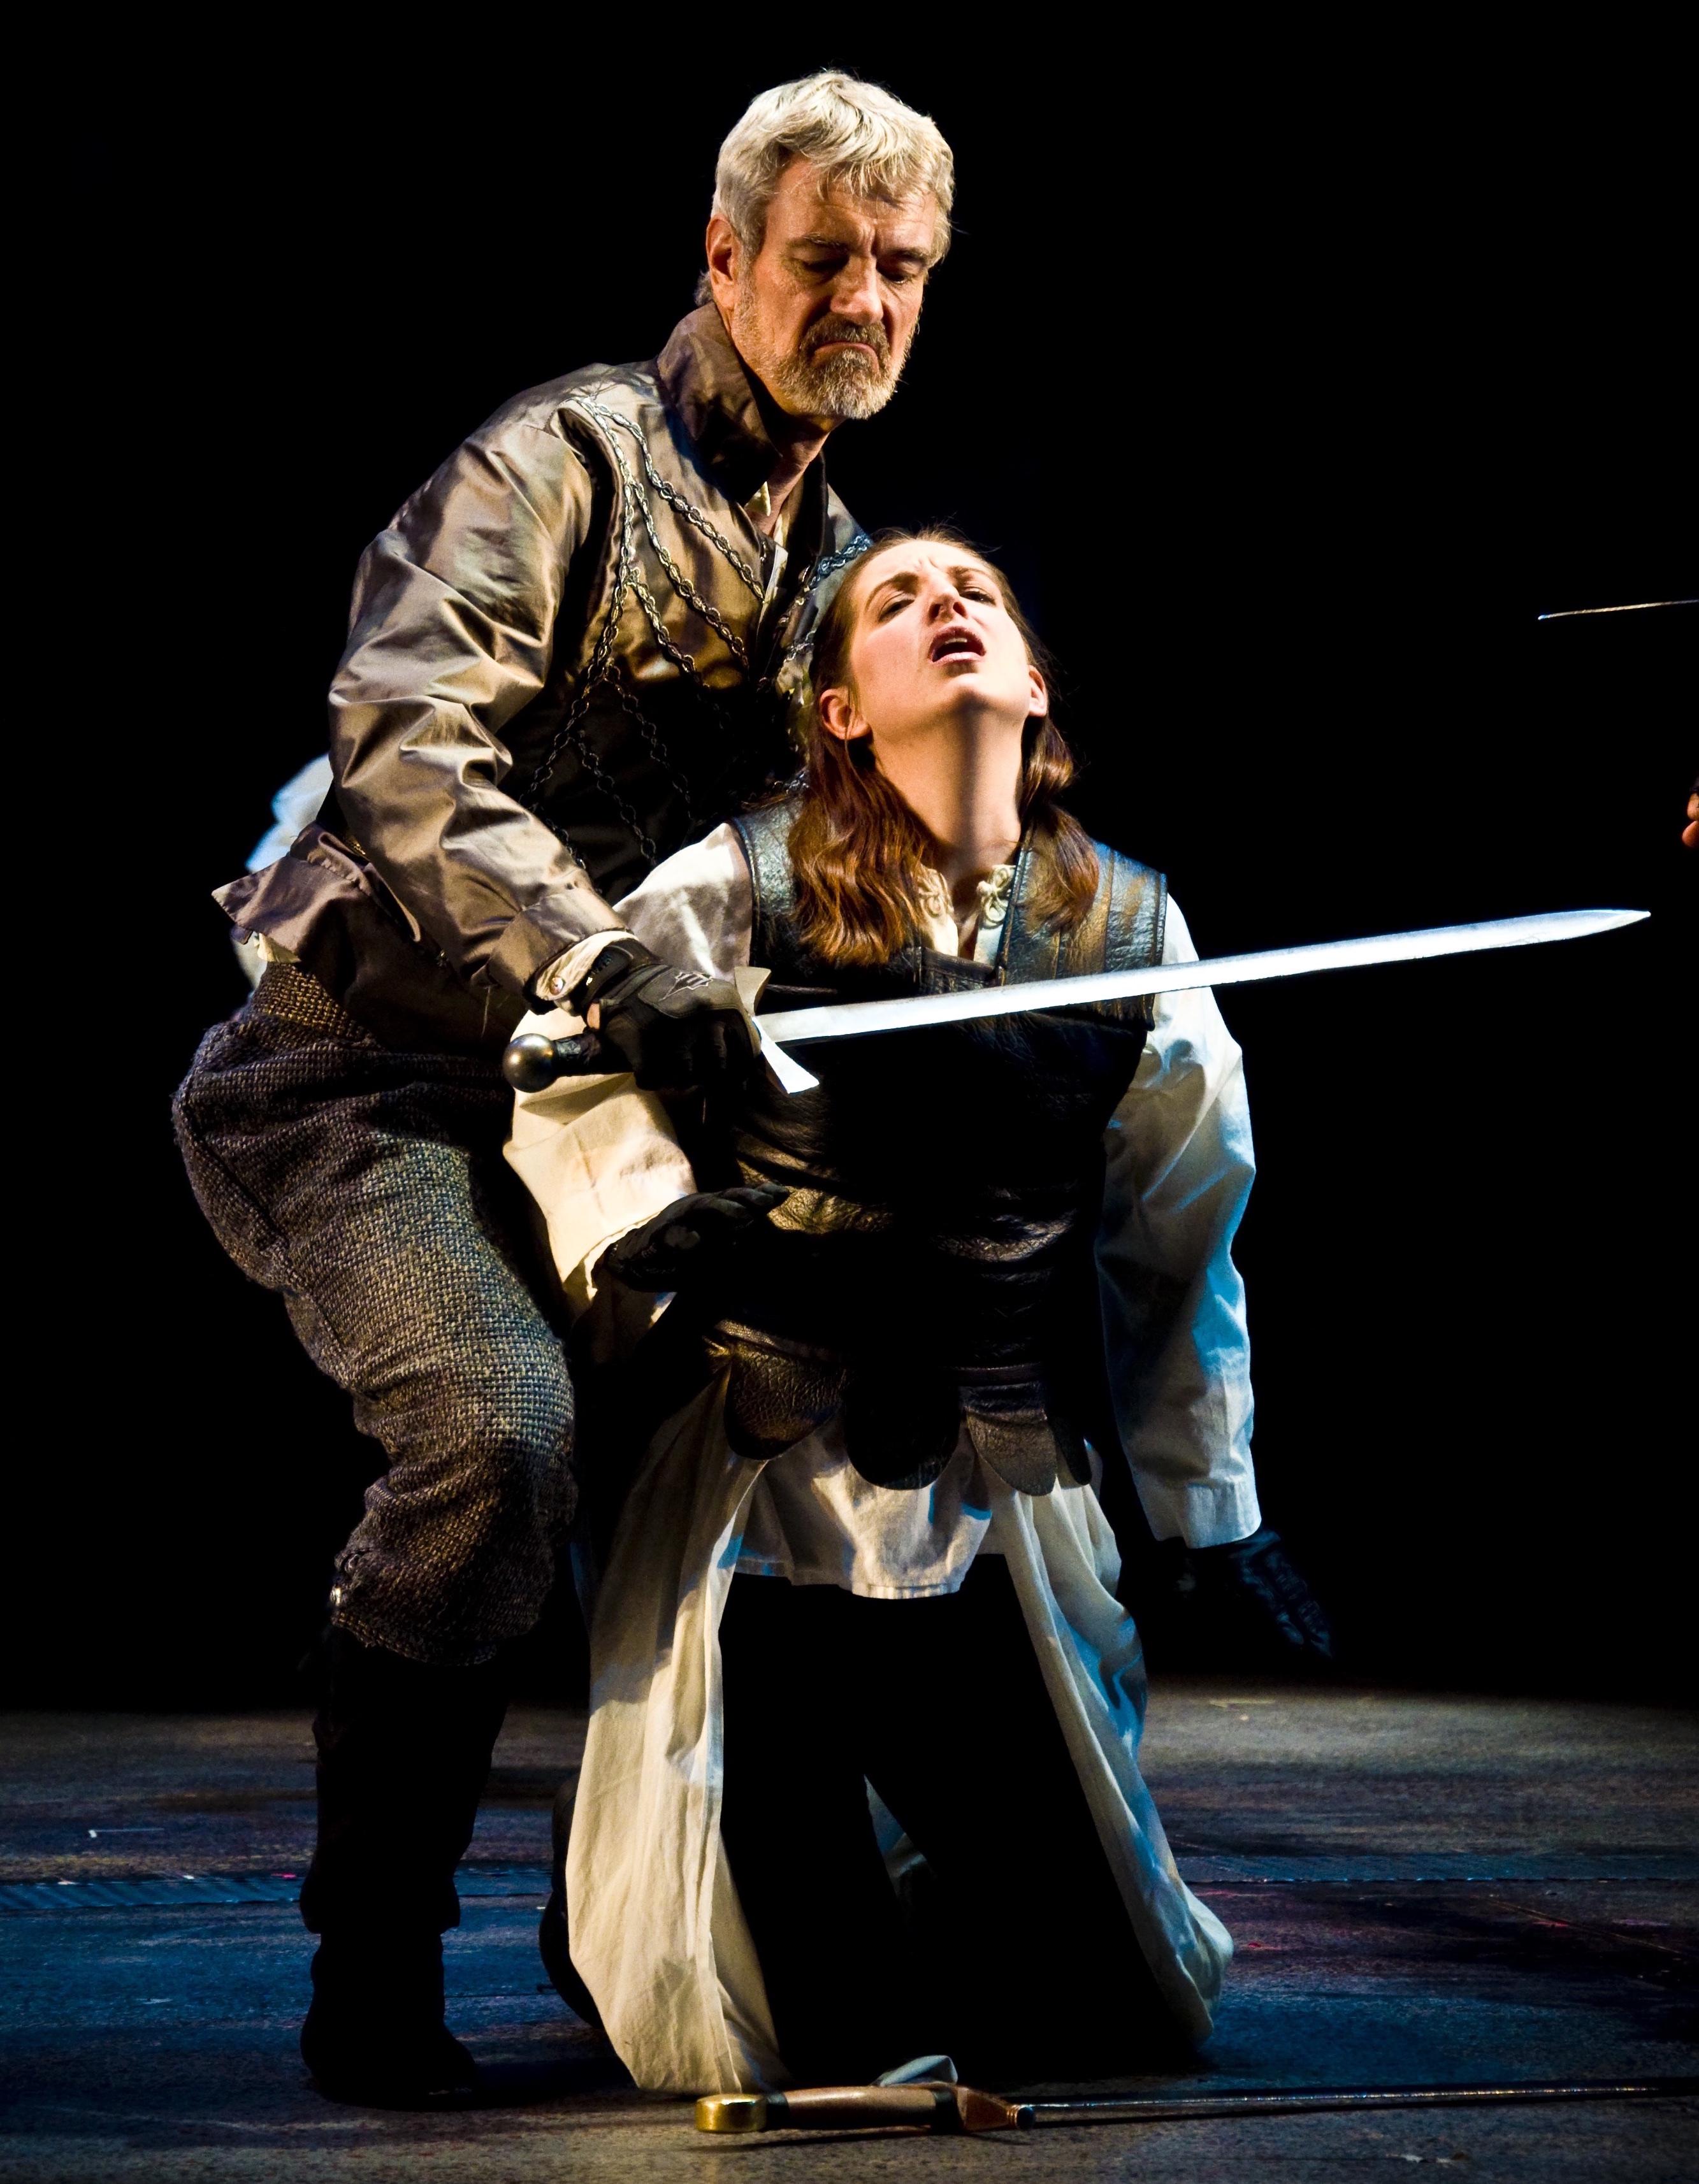 Blood Royal/Joan of Arc